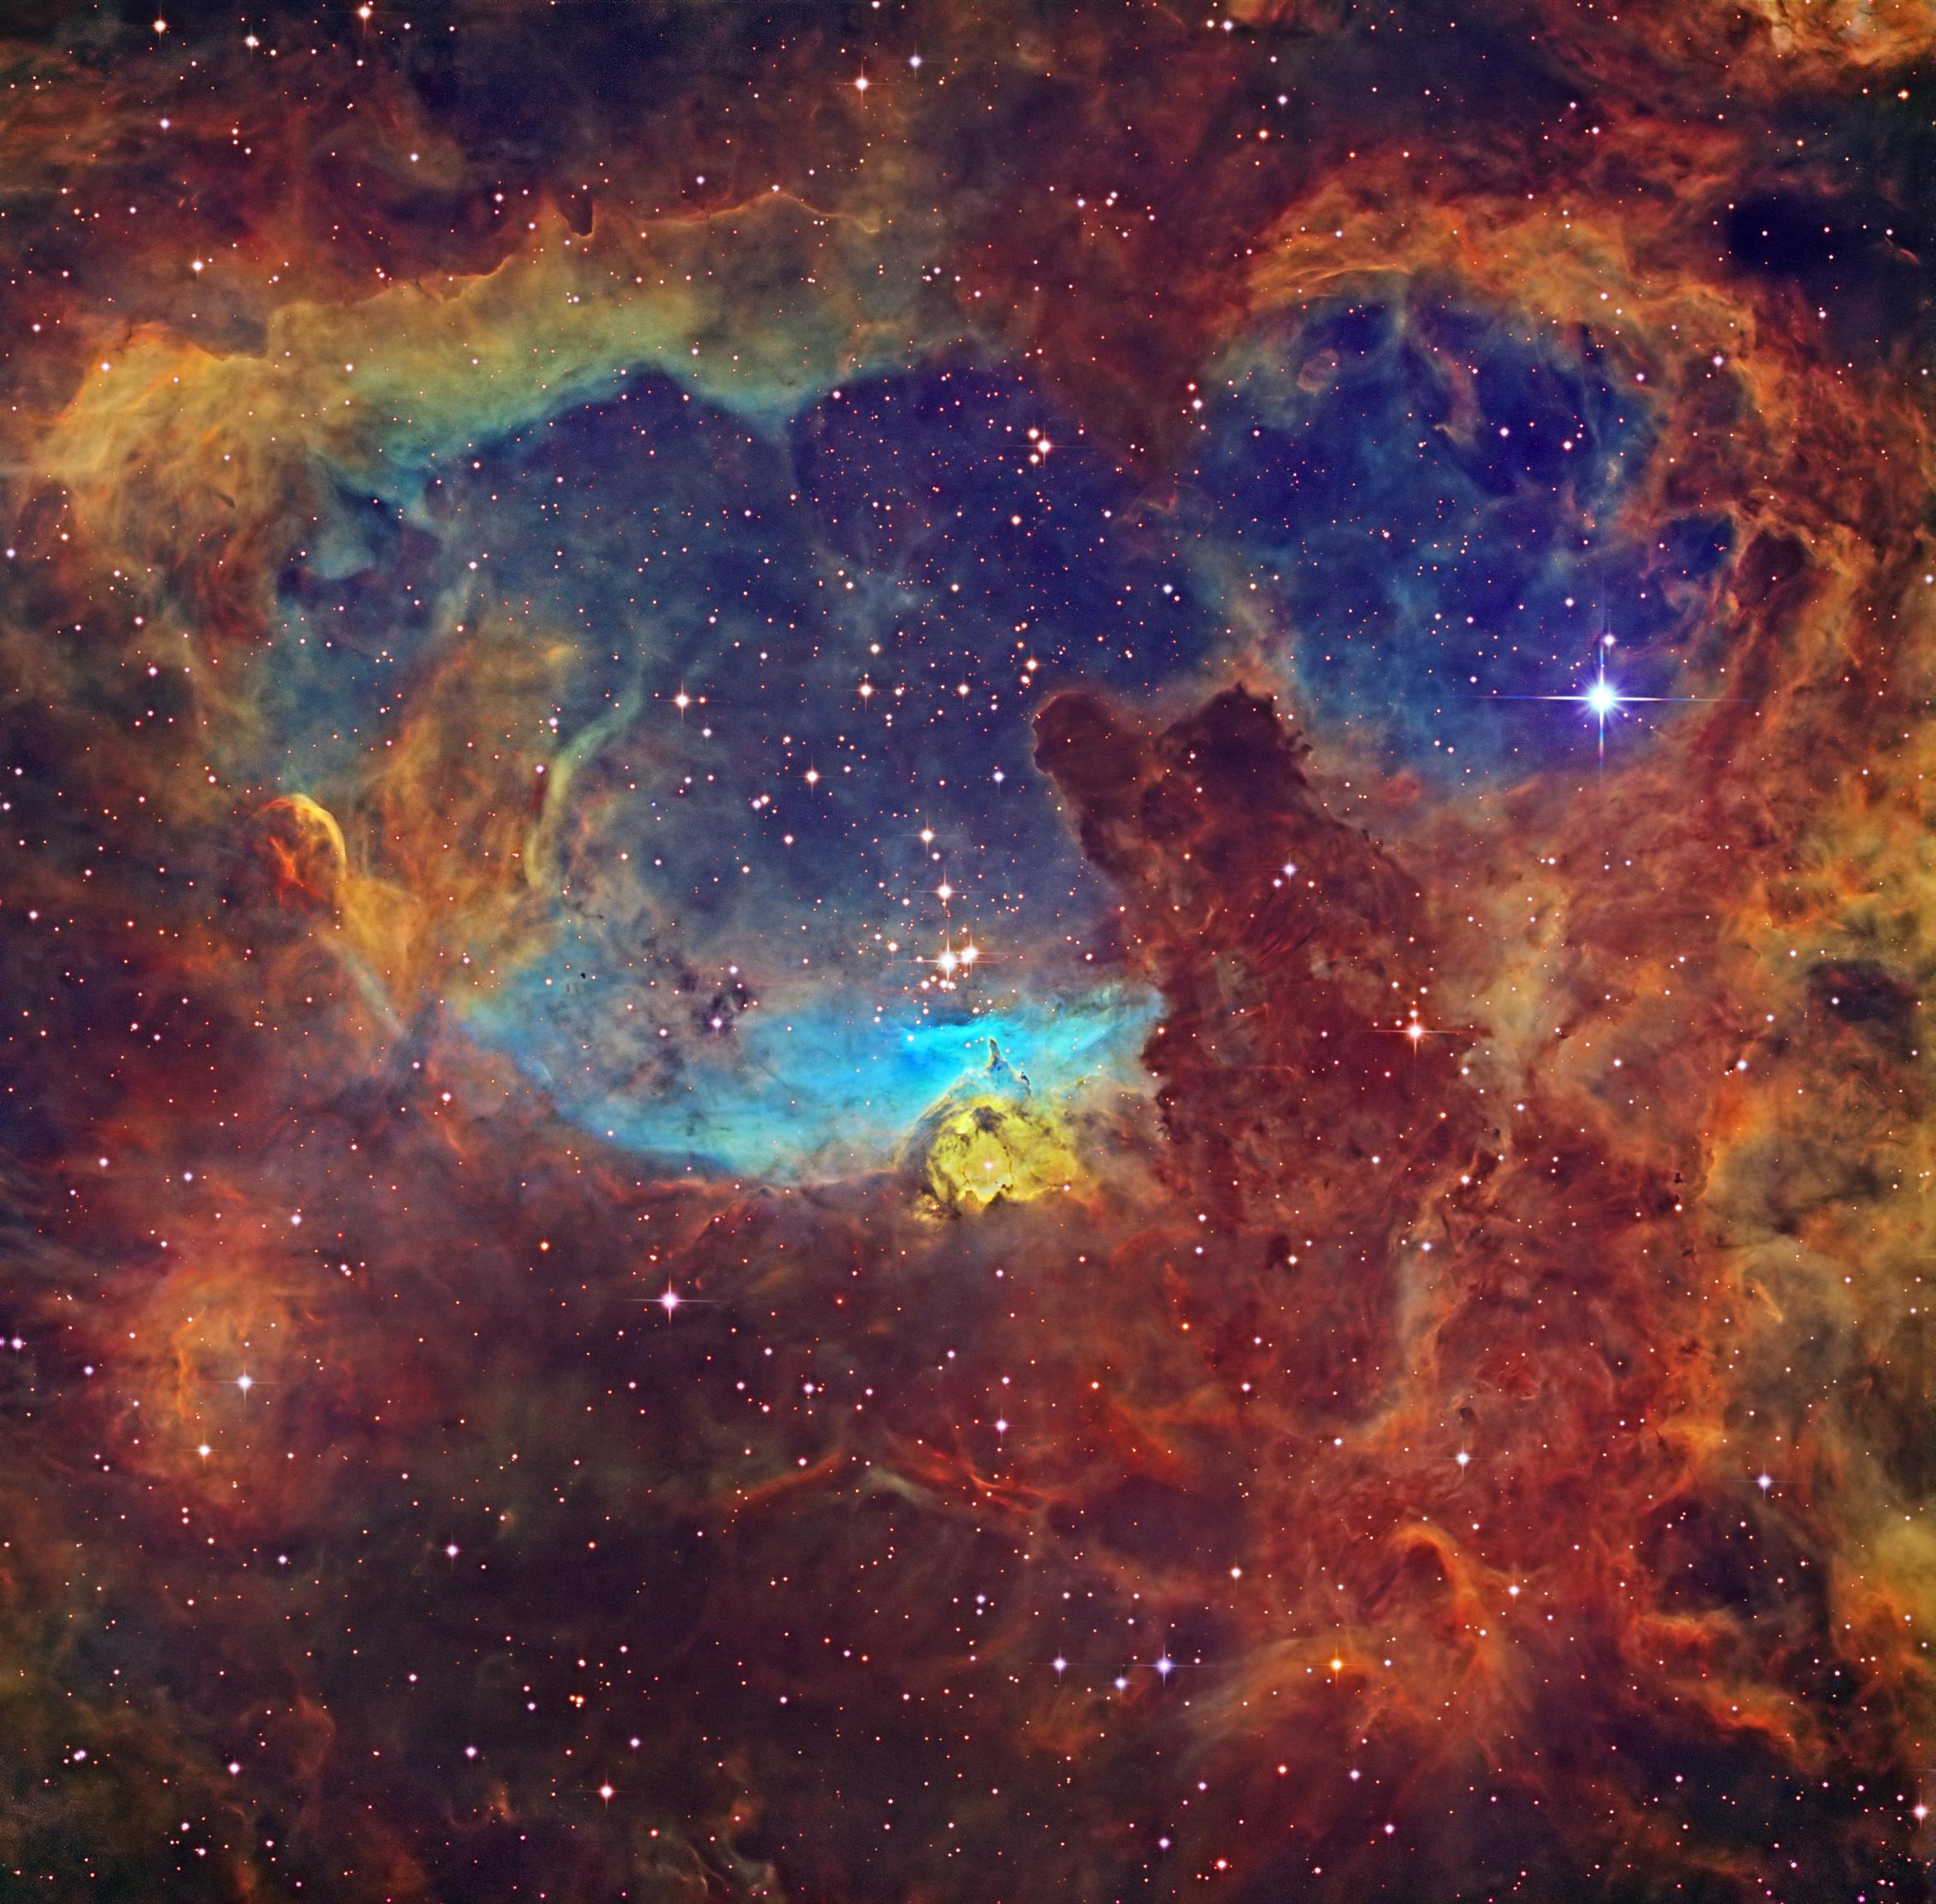 2016 February 5 - Massive Stars in NGC 6357